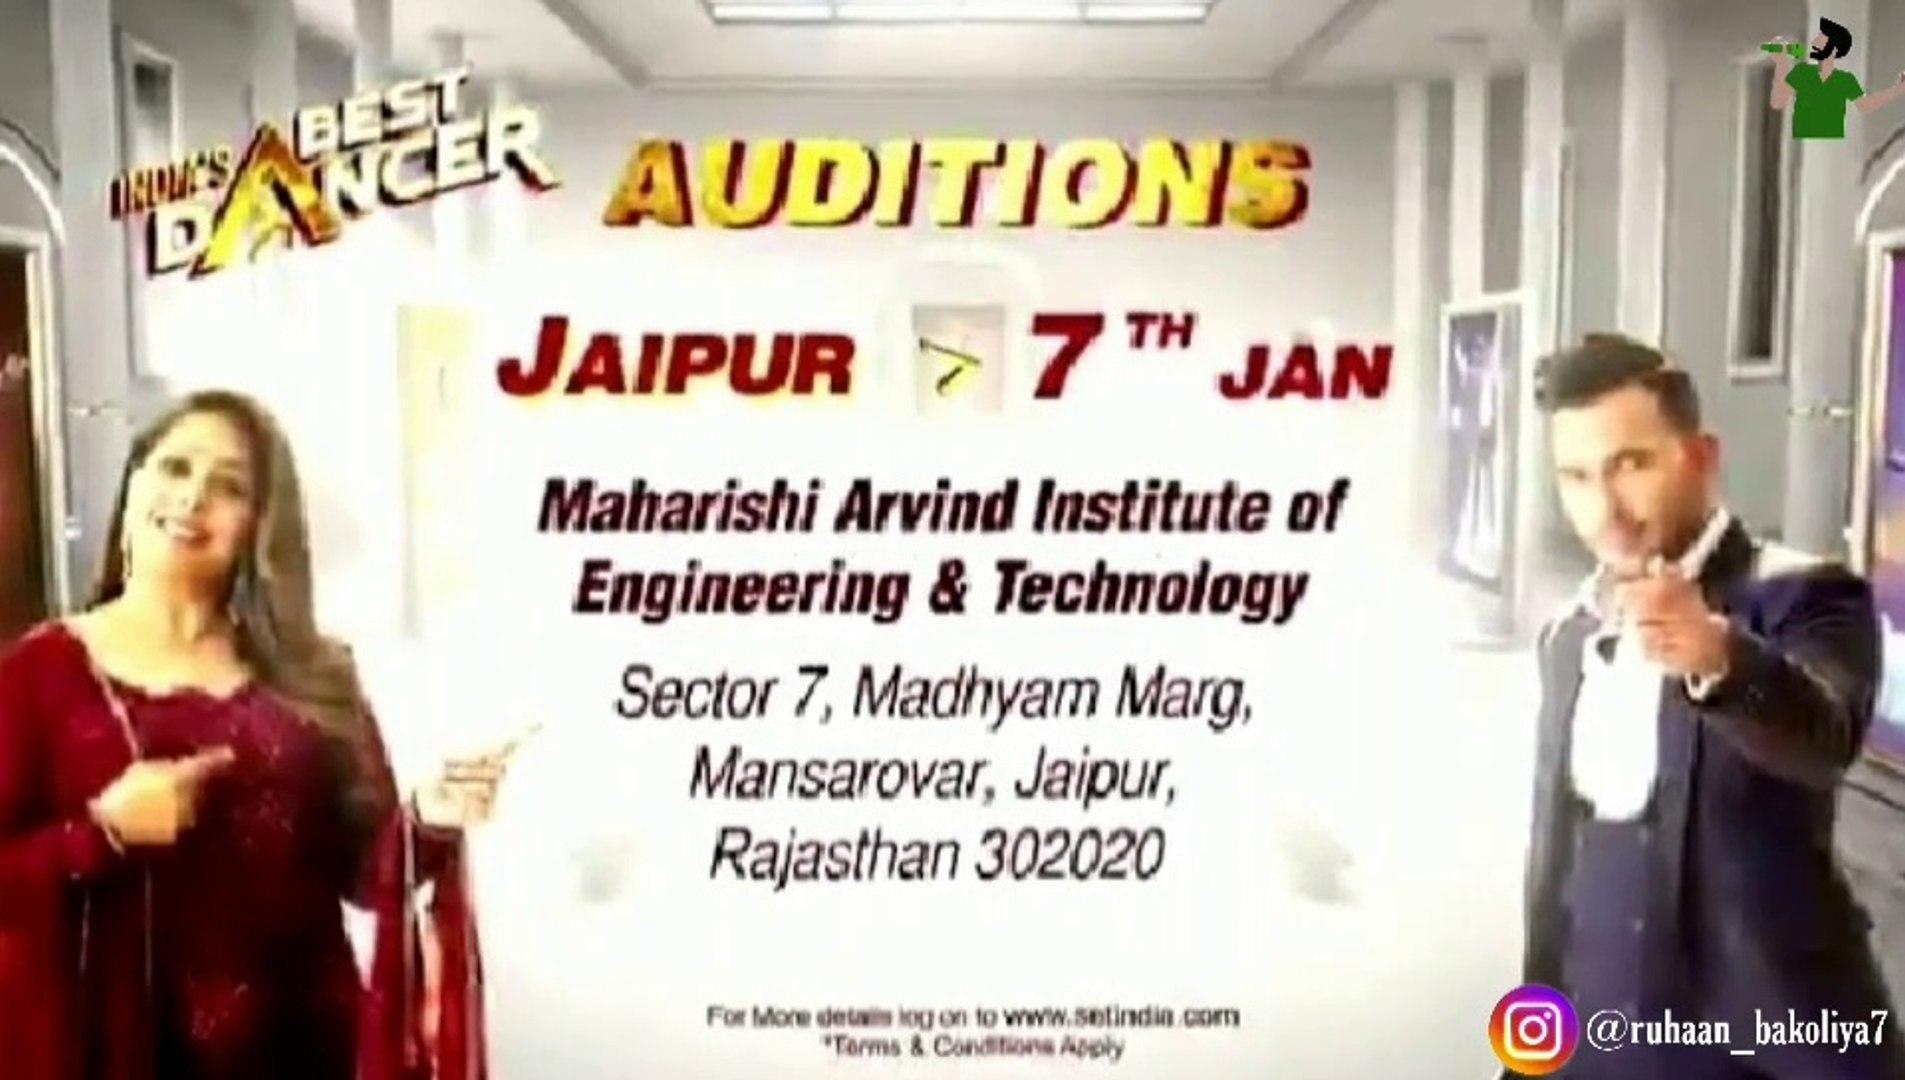 INDIA'S BEST DANCER JAIPUR AUDITION 2020   DANCING AUDITION 2020   JAIPUR AUDITION 2020